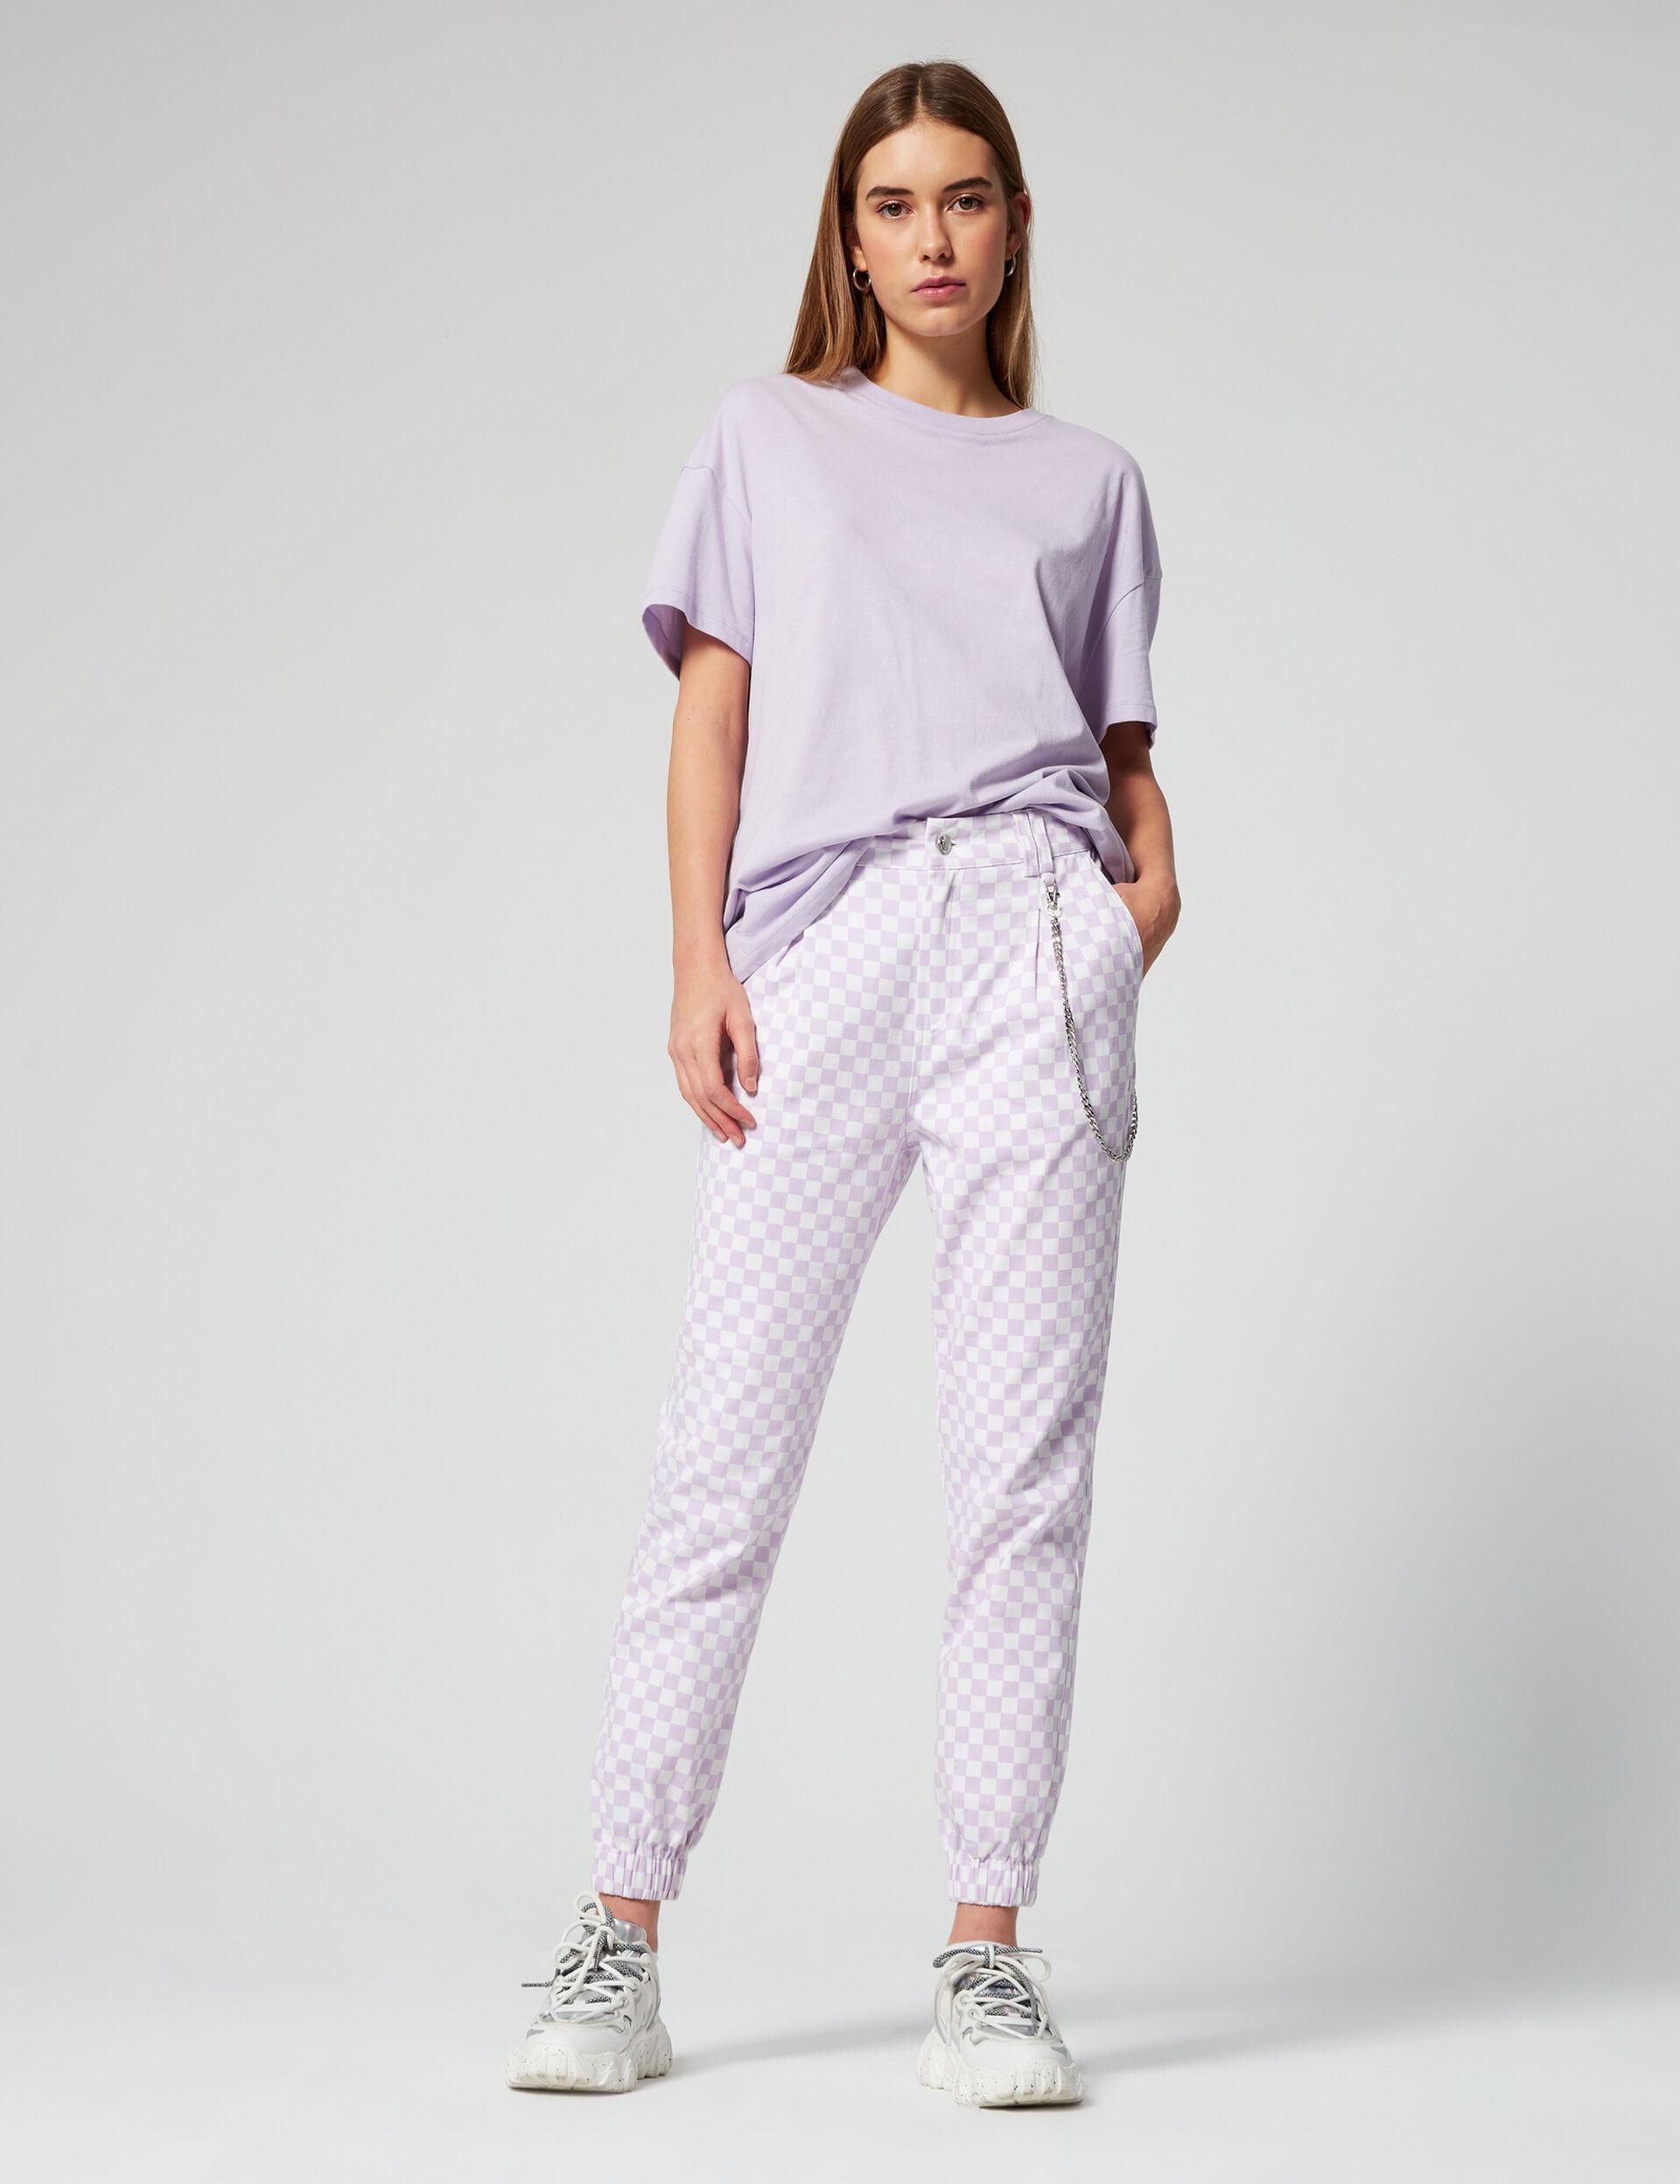 Checked print cargo pants